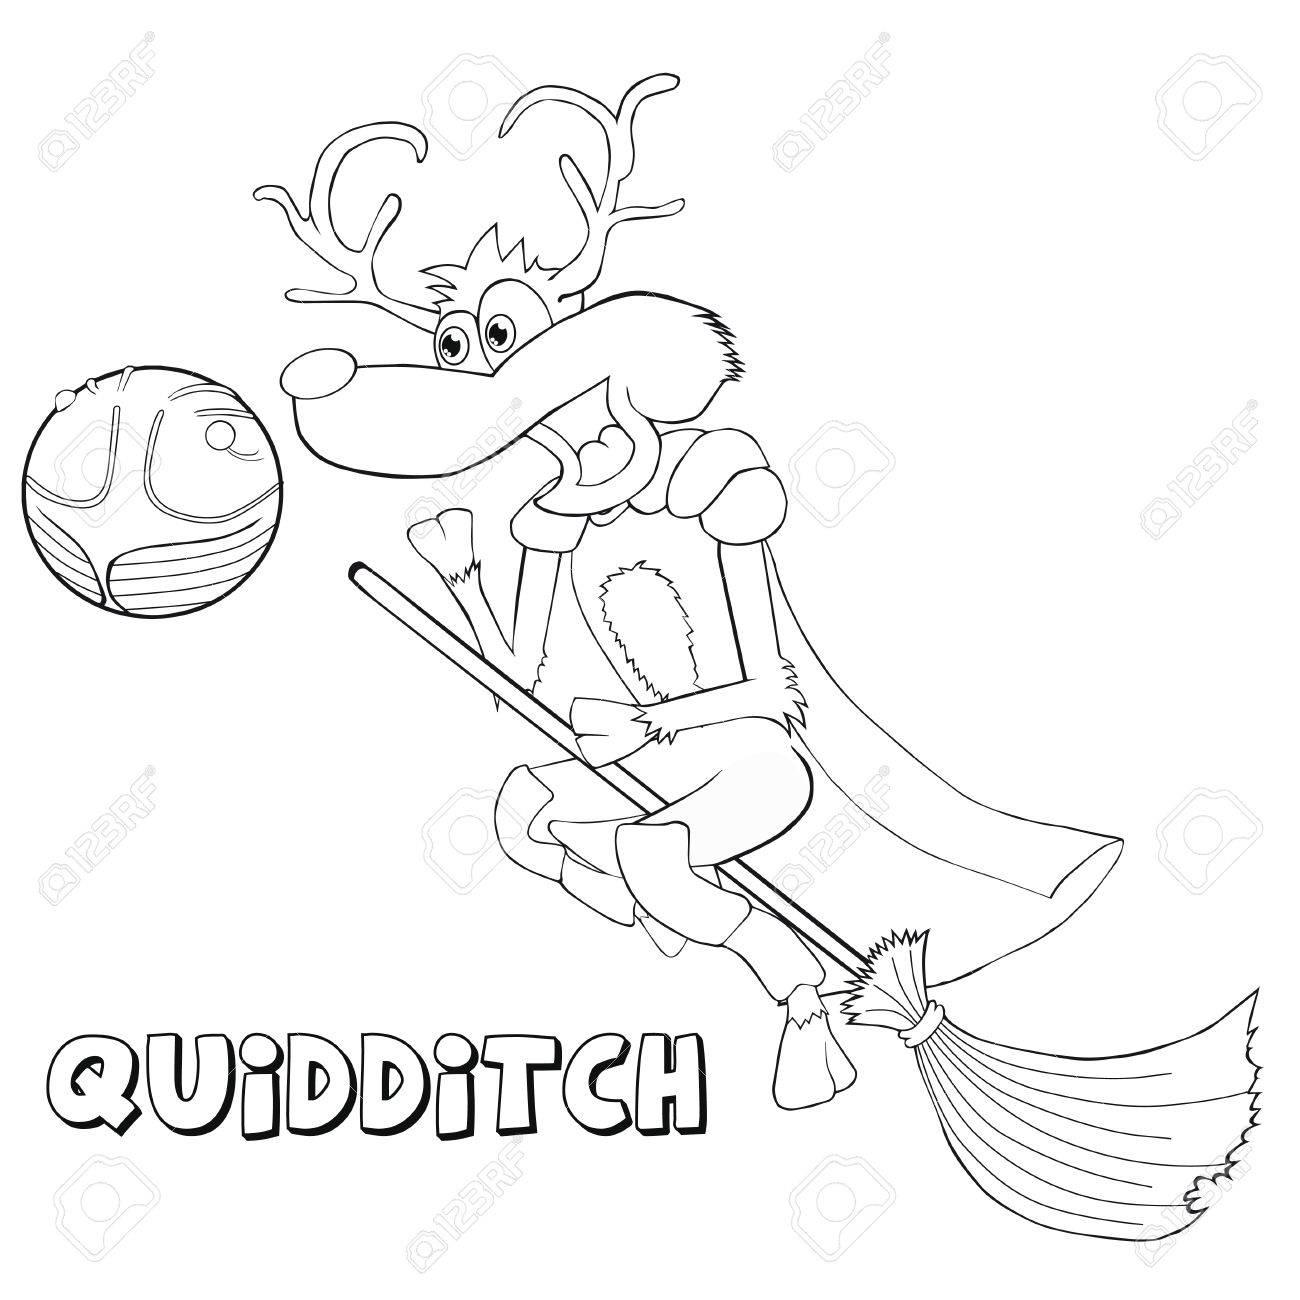 Coloring Book Deer Plays Quidditch Cartoon Style Clip Art For Children Stock Vector